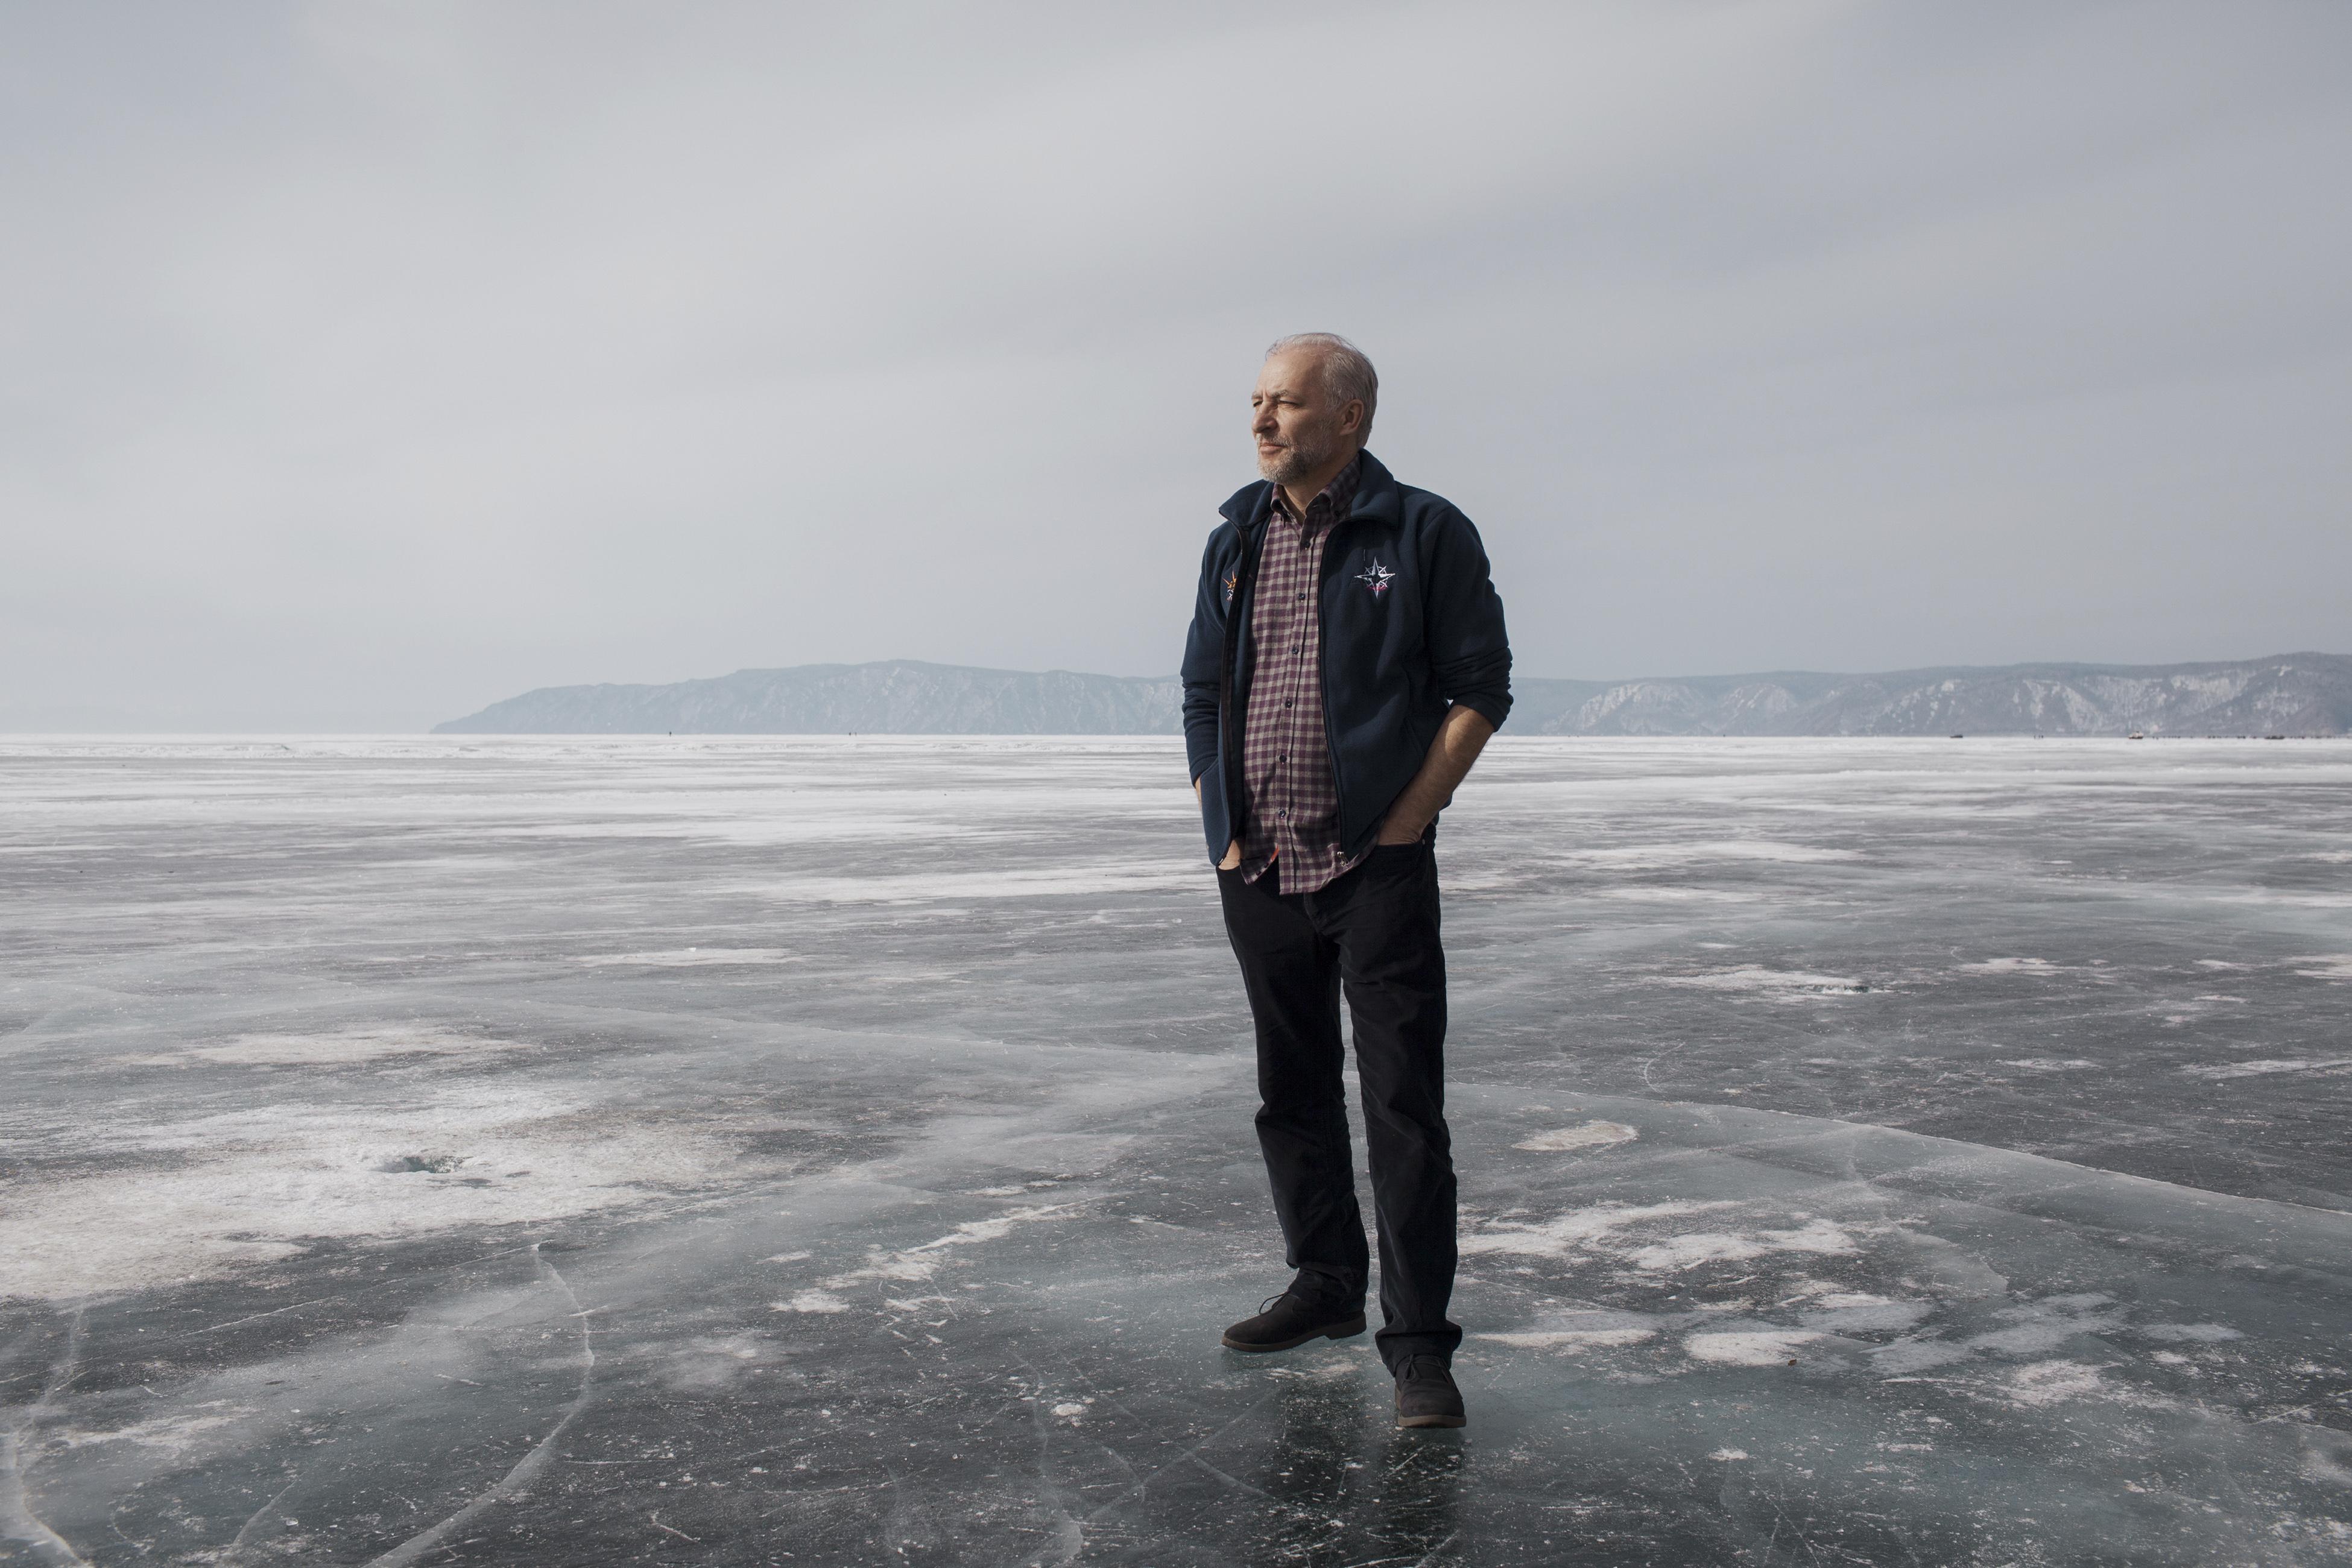 Aleksey P. Nikiforov, founder of the Baikal Ice Marathon, on Lake Baikal on March 3, 2019.